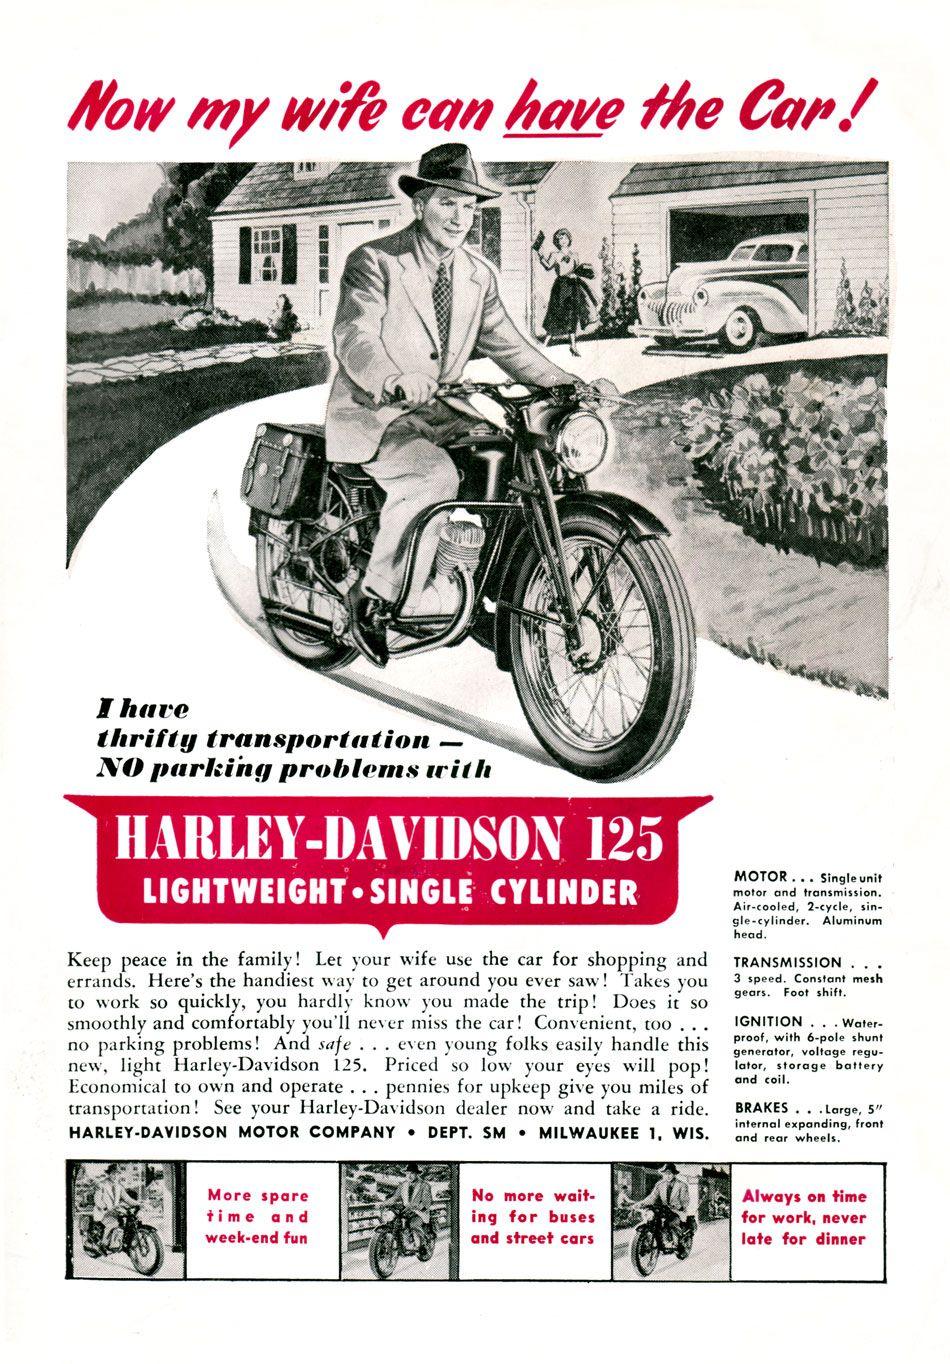 Harley Davidson Ad From 1958 Harley Davidson Posters Harley Davidson Vintage Harley